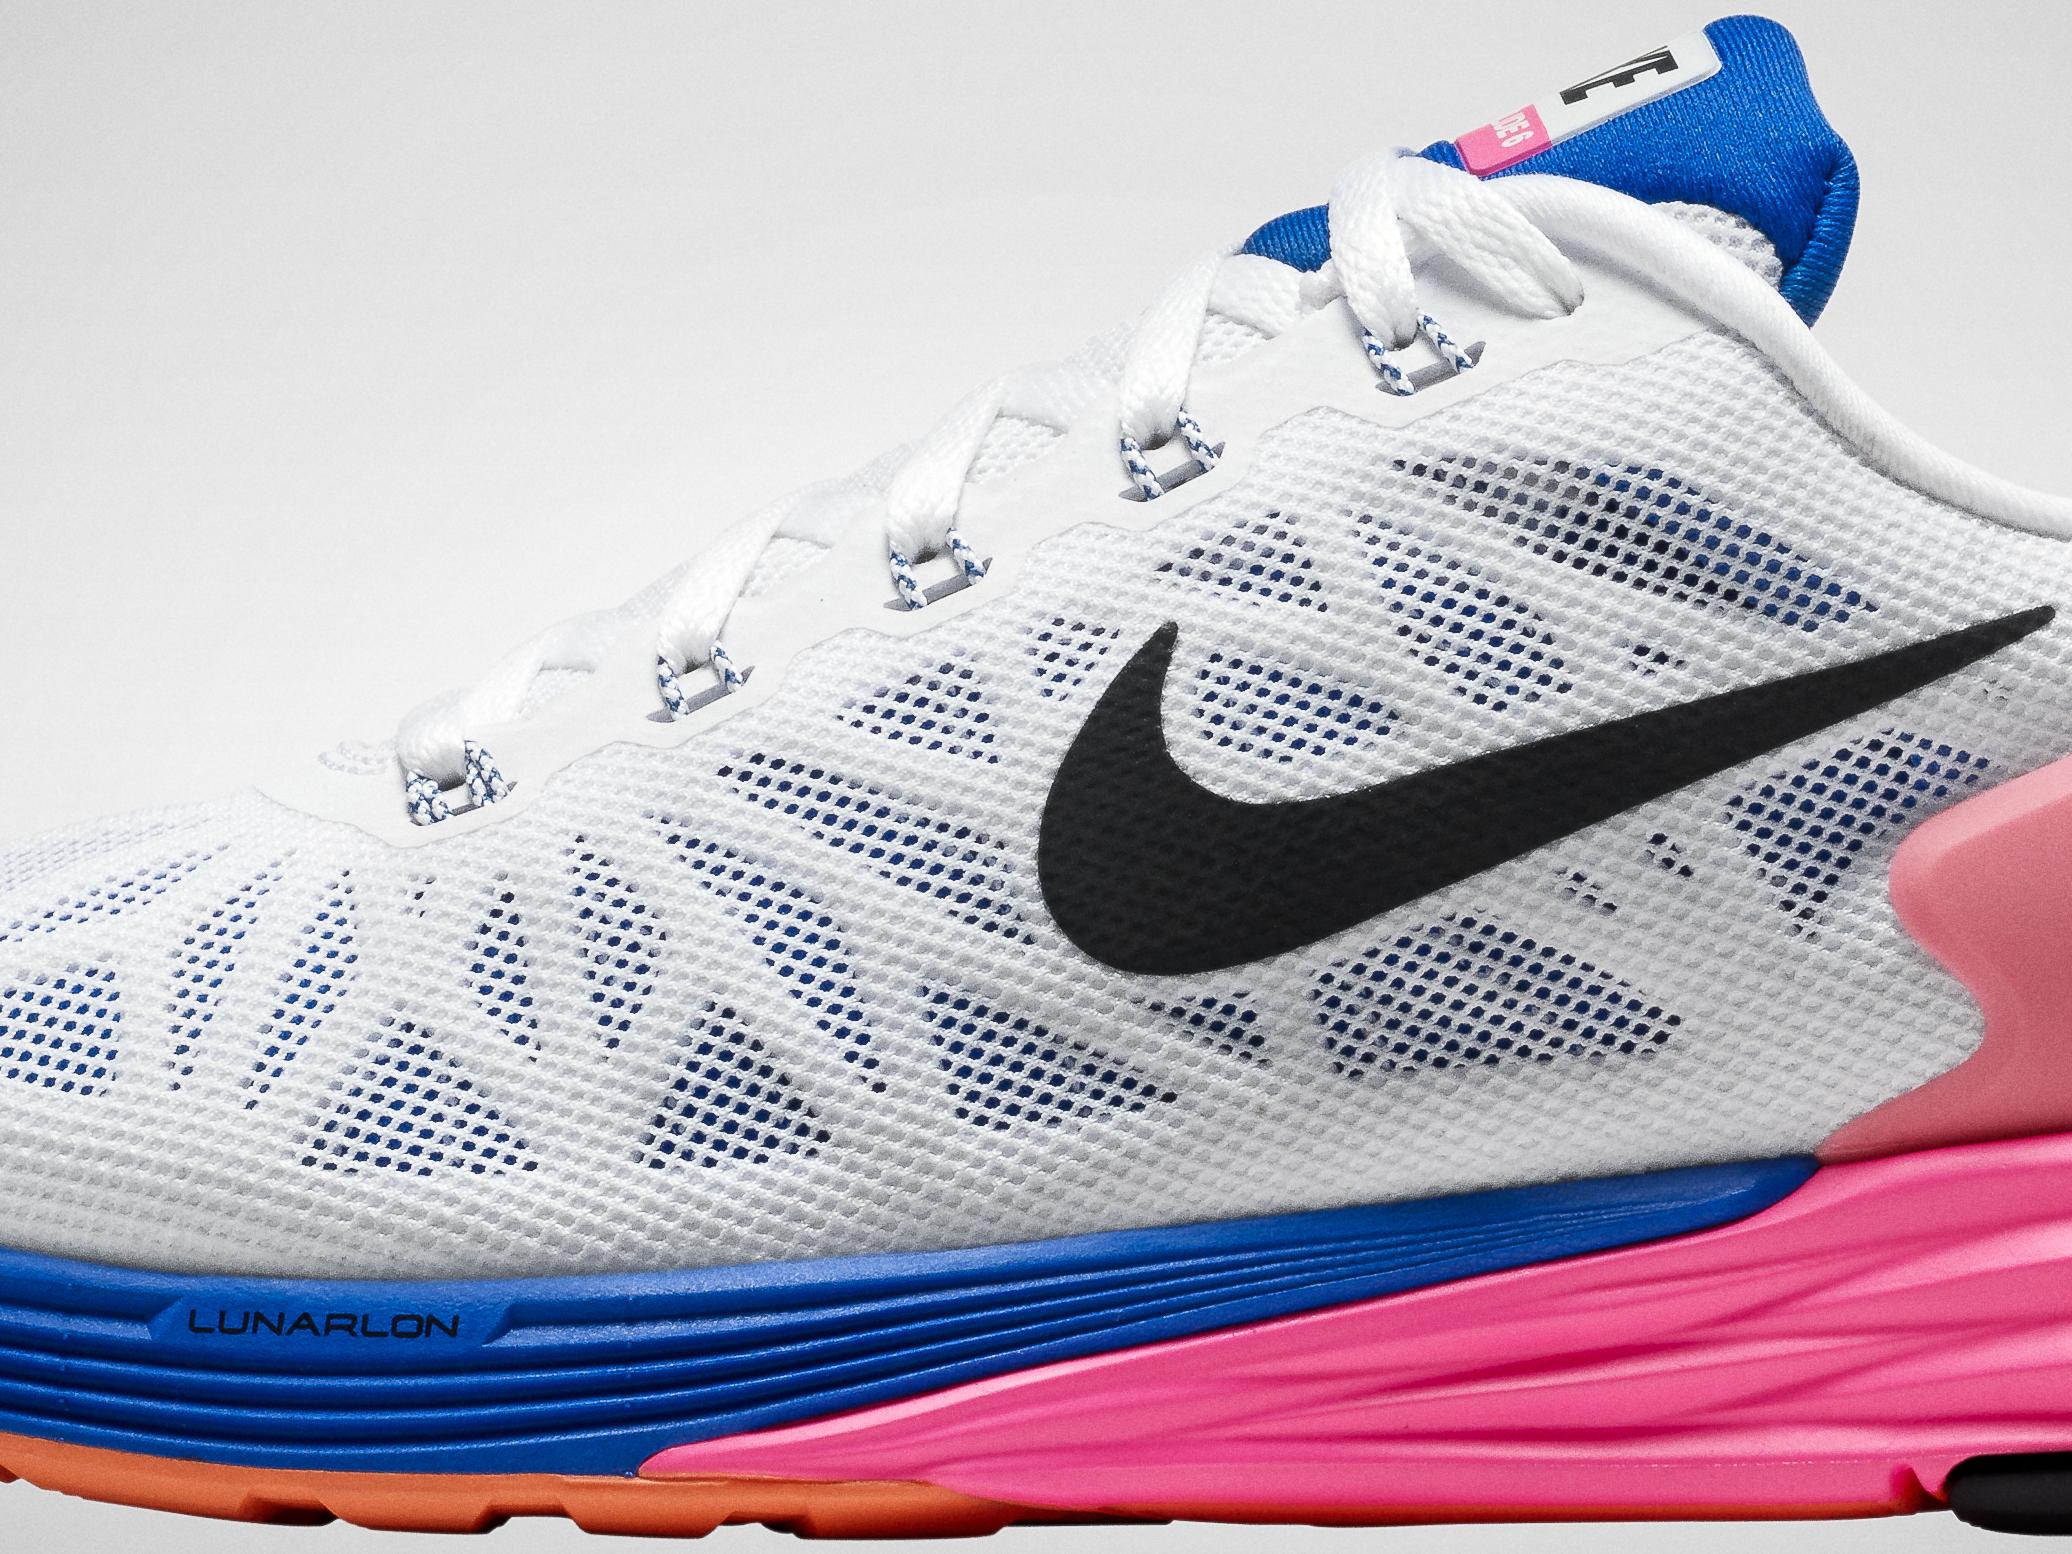 Nike_LunarGlide6_Womens_UpperDetail_30387